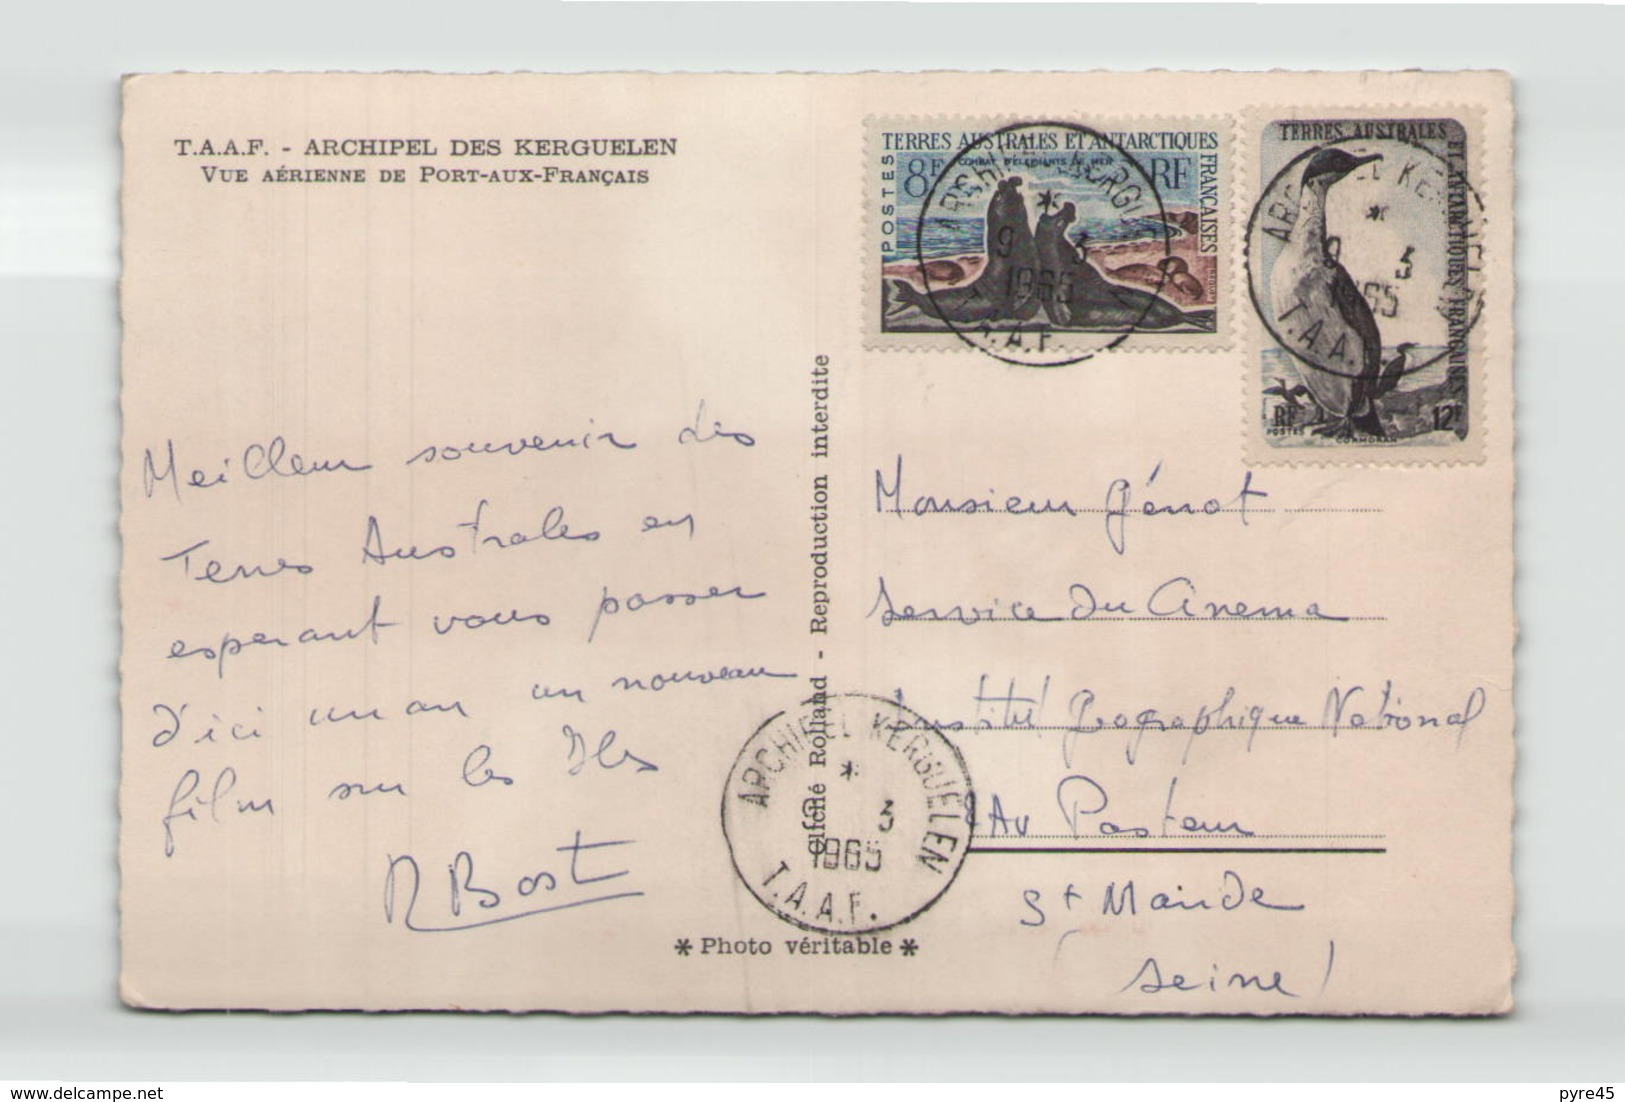 TAAF ARCHIPEL DES KERGUELEN VUE AERIENNE DE PORT AUX FRANCAIS SIGNE RENE BOST 1965 - TAAF : French Southern And Antarctic Lands